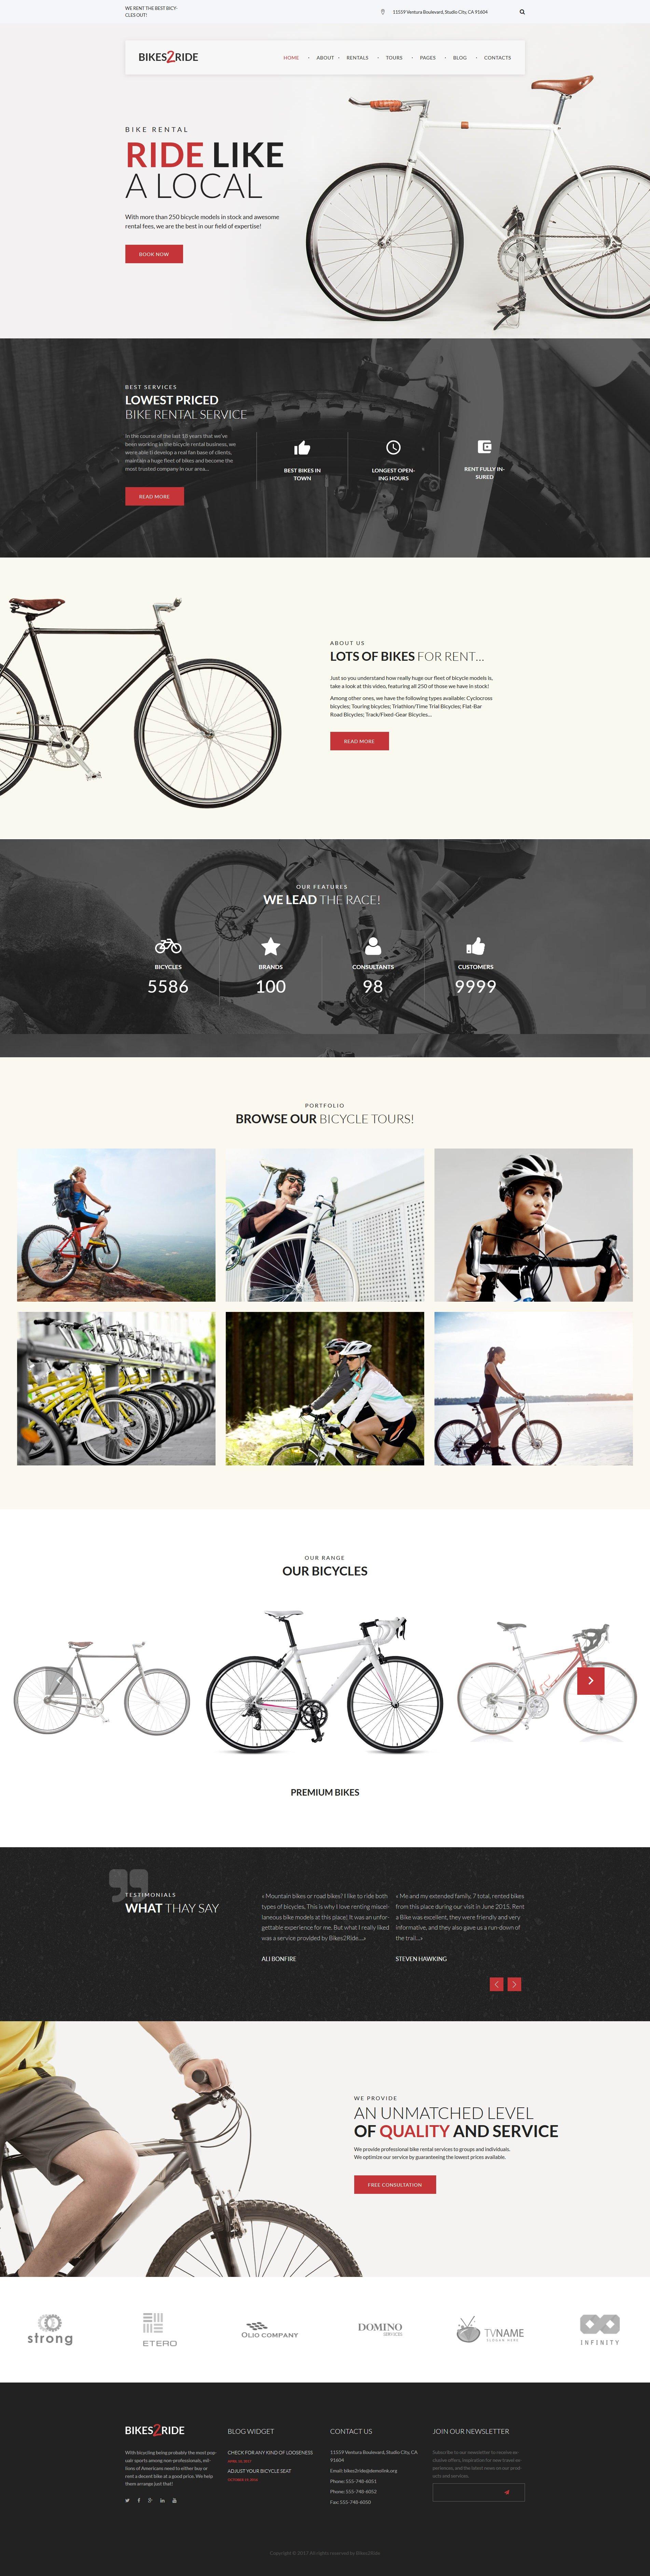 """Bikes2Ride - Cycling"" - адаптивний WordPress шаблон №64031"